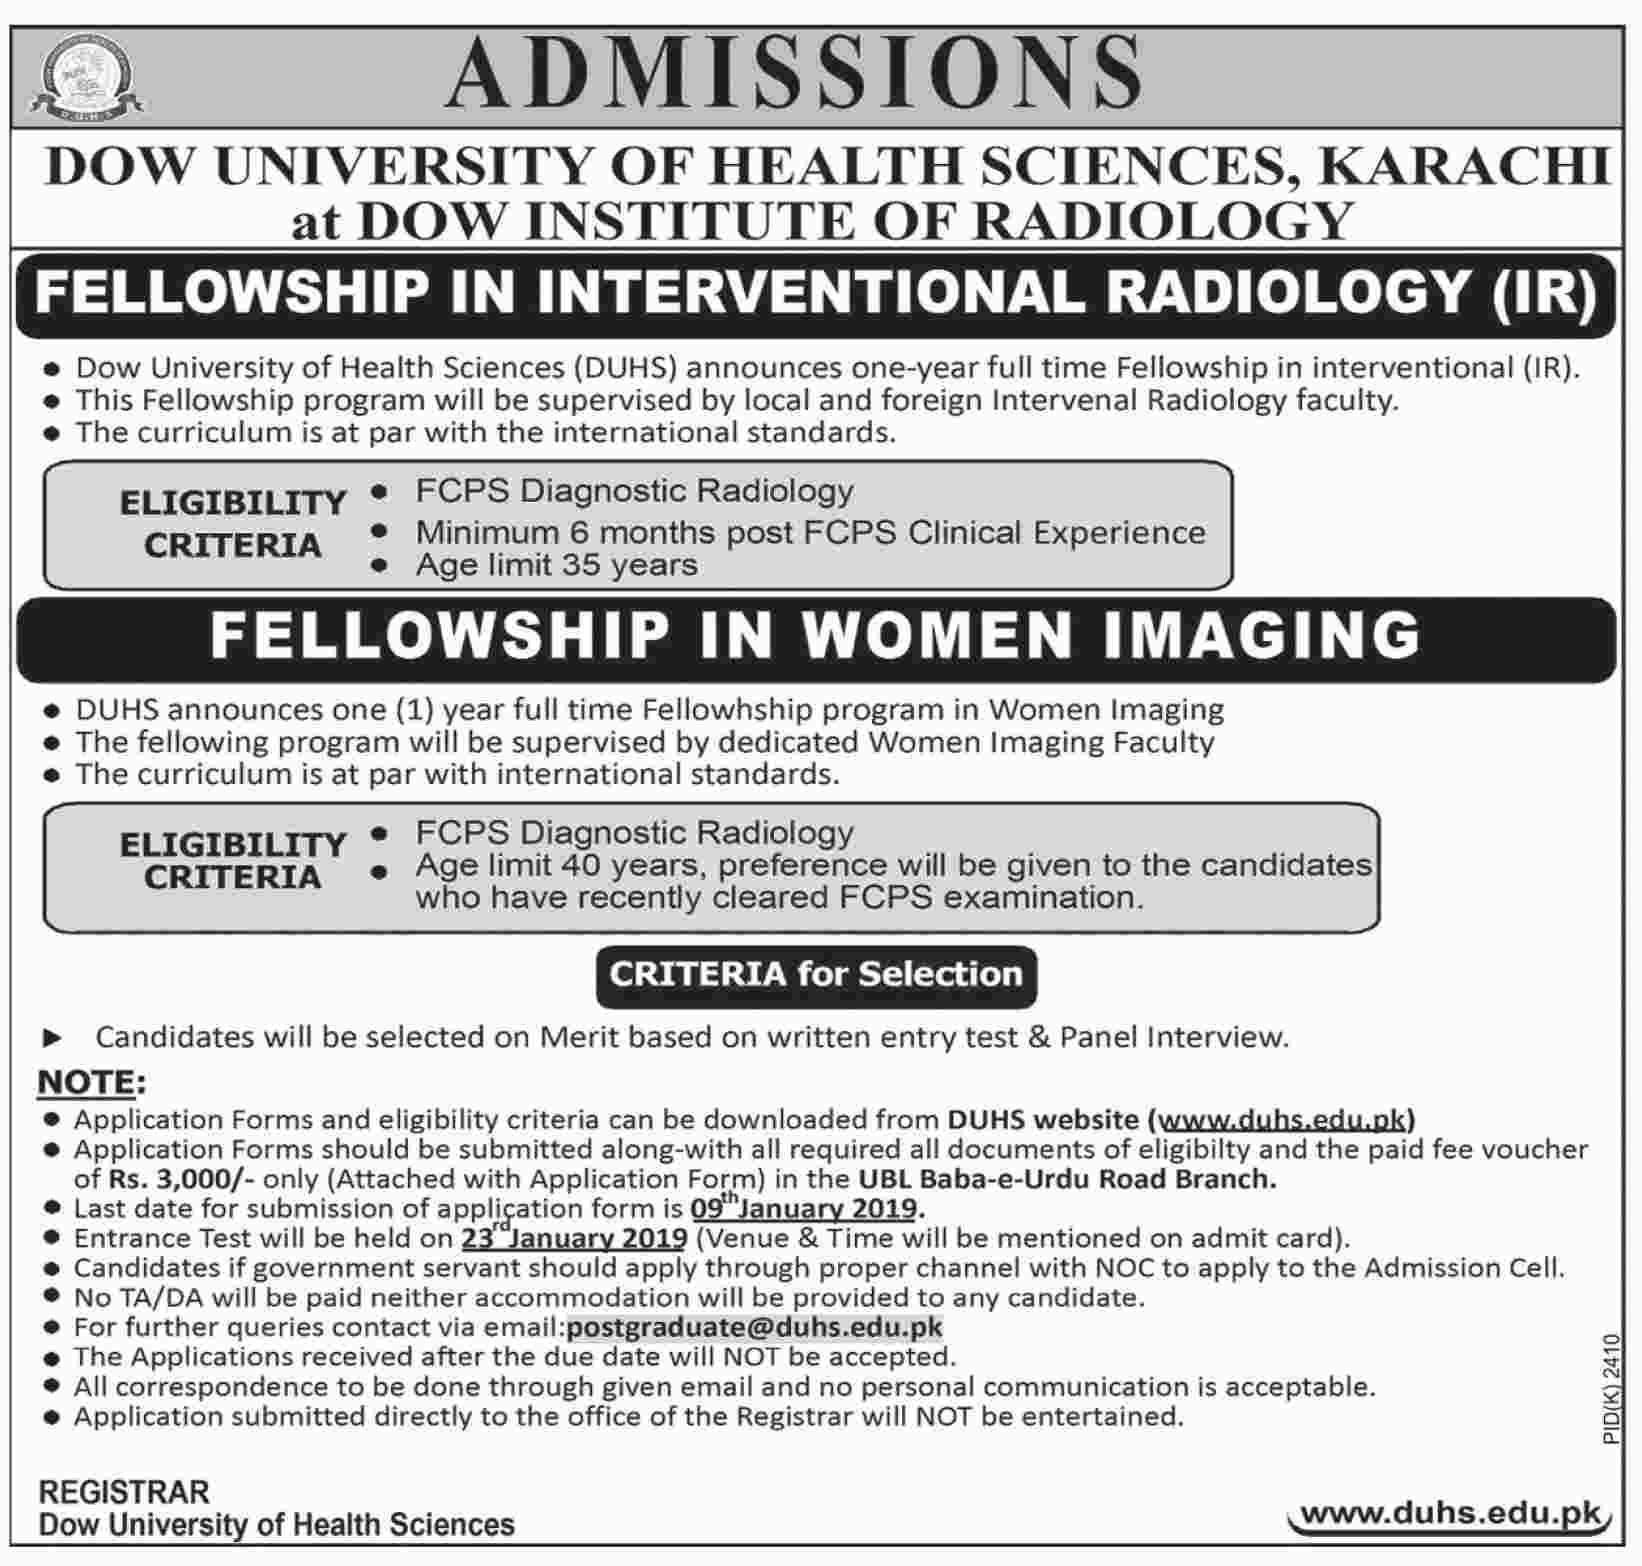 Fellowship in International Radiology (IR) - Dow University of Health Sciences